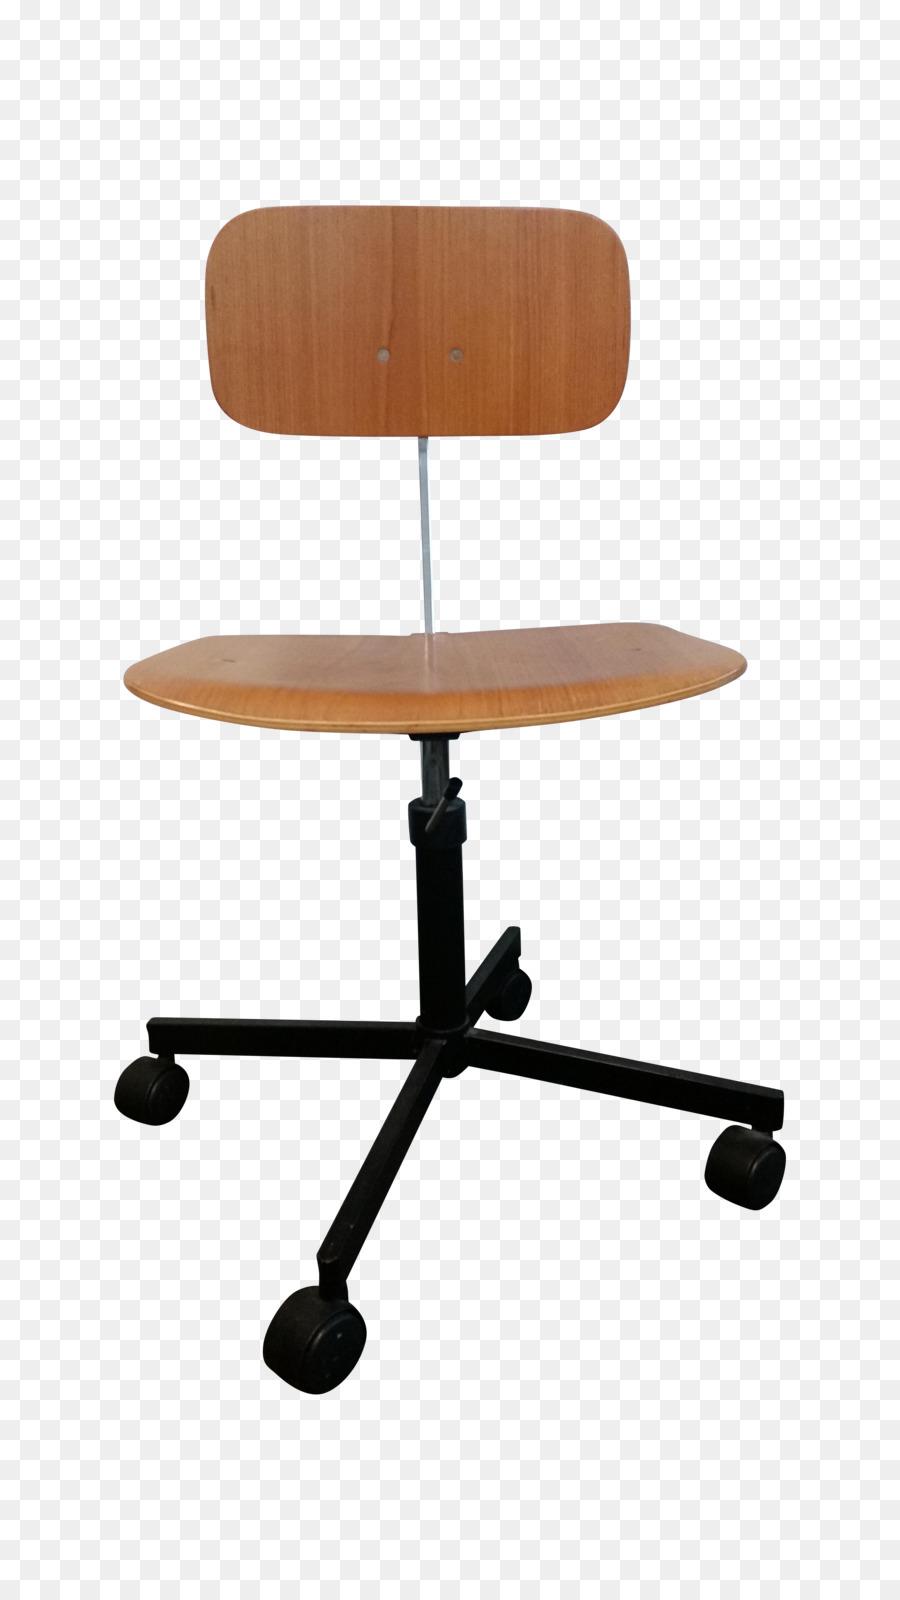 Tisch Büroarbeitsstühle Aeron Stuhl Tabelle png qVLUzMpSG